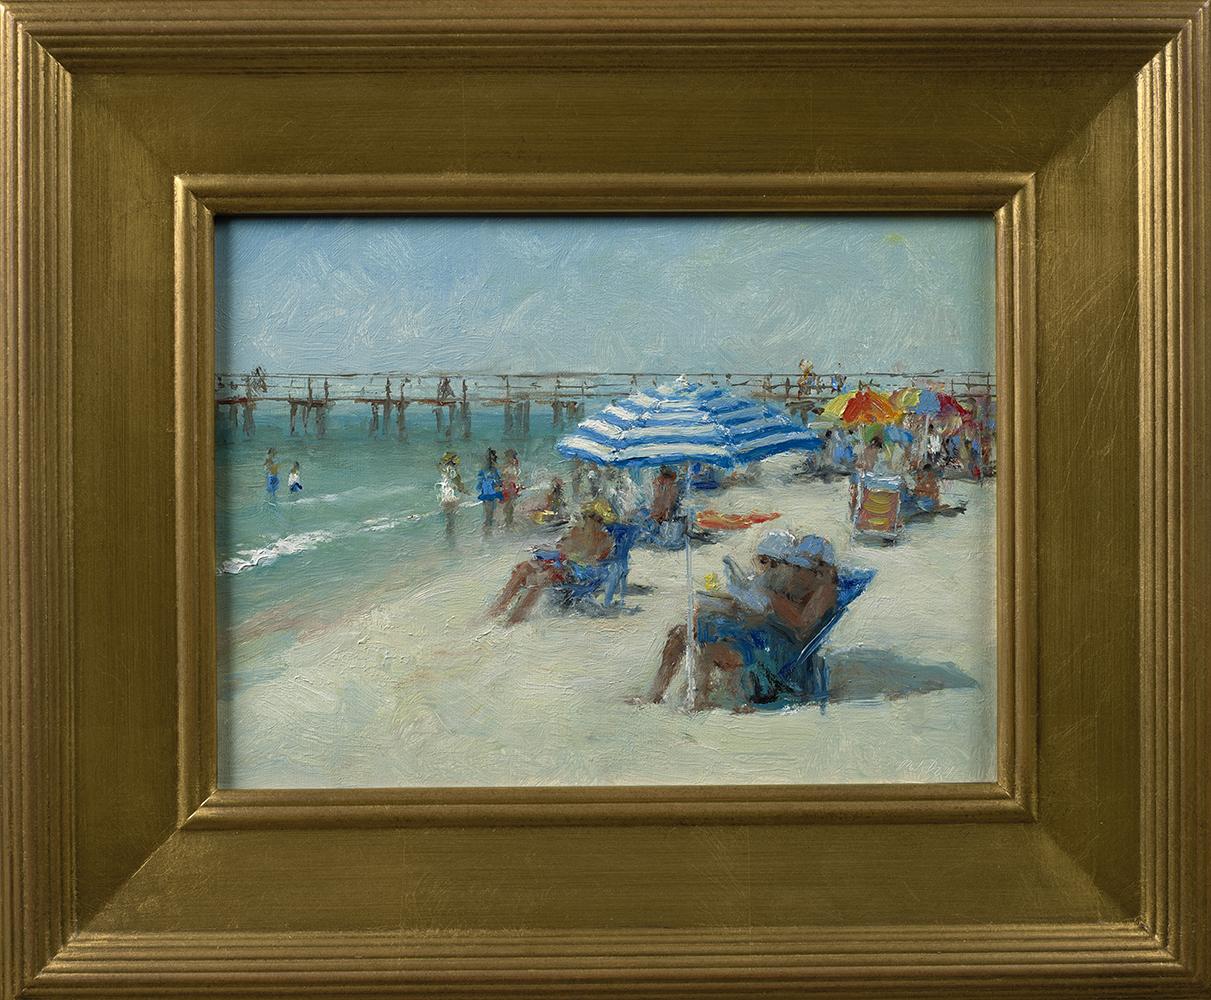 mark_daly_md1067_blue_striped_umbrella_naples_florida_framed.jpg